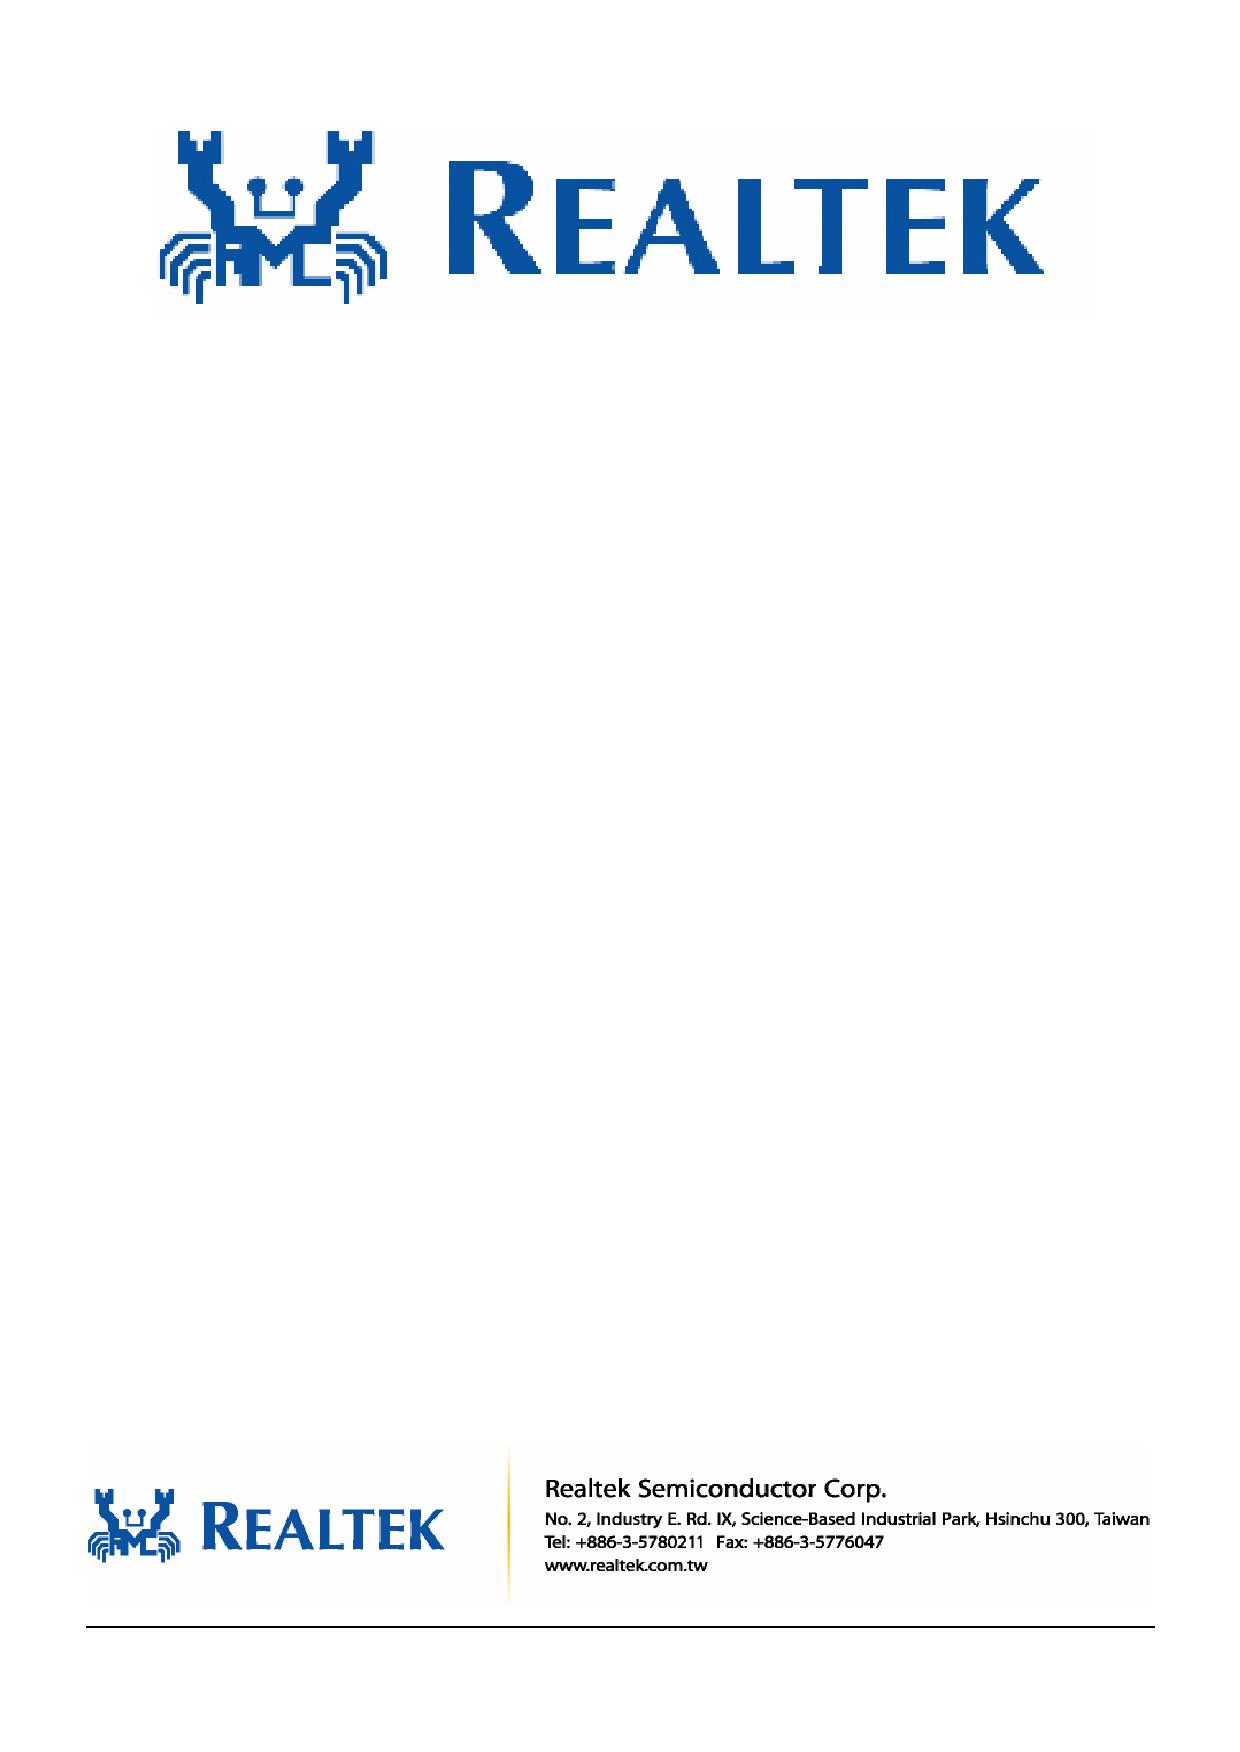 RTL8671B datasheet image